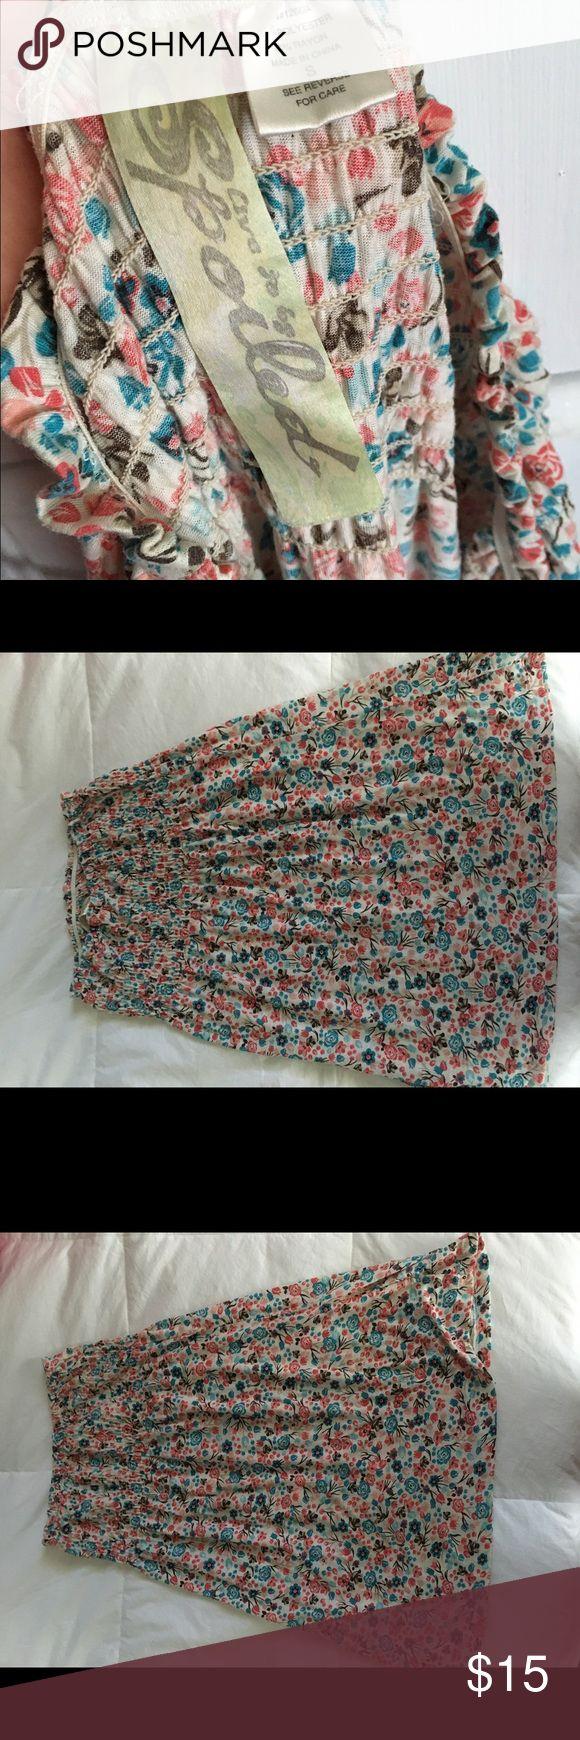 Tube top mini dress. Summer tube top floral print mini dress. Spoiled brand. Size small. Dresses